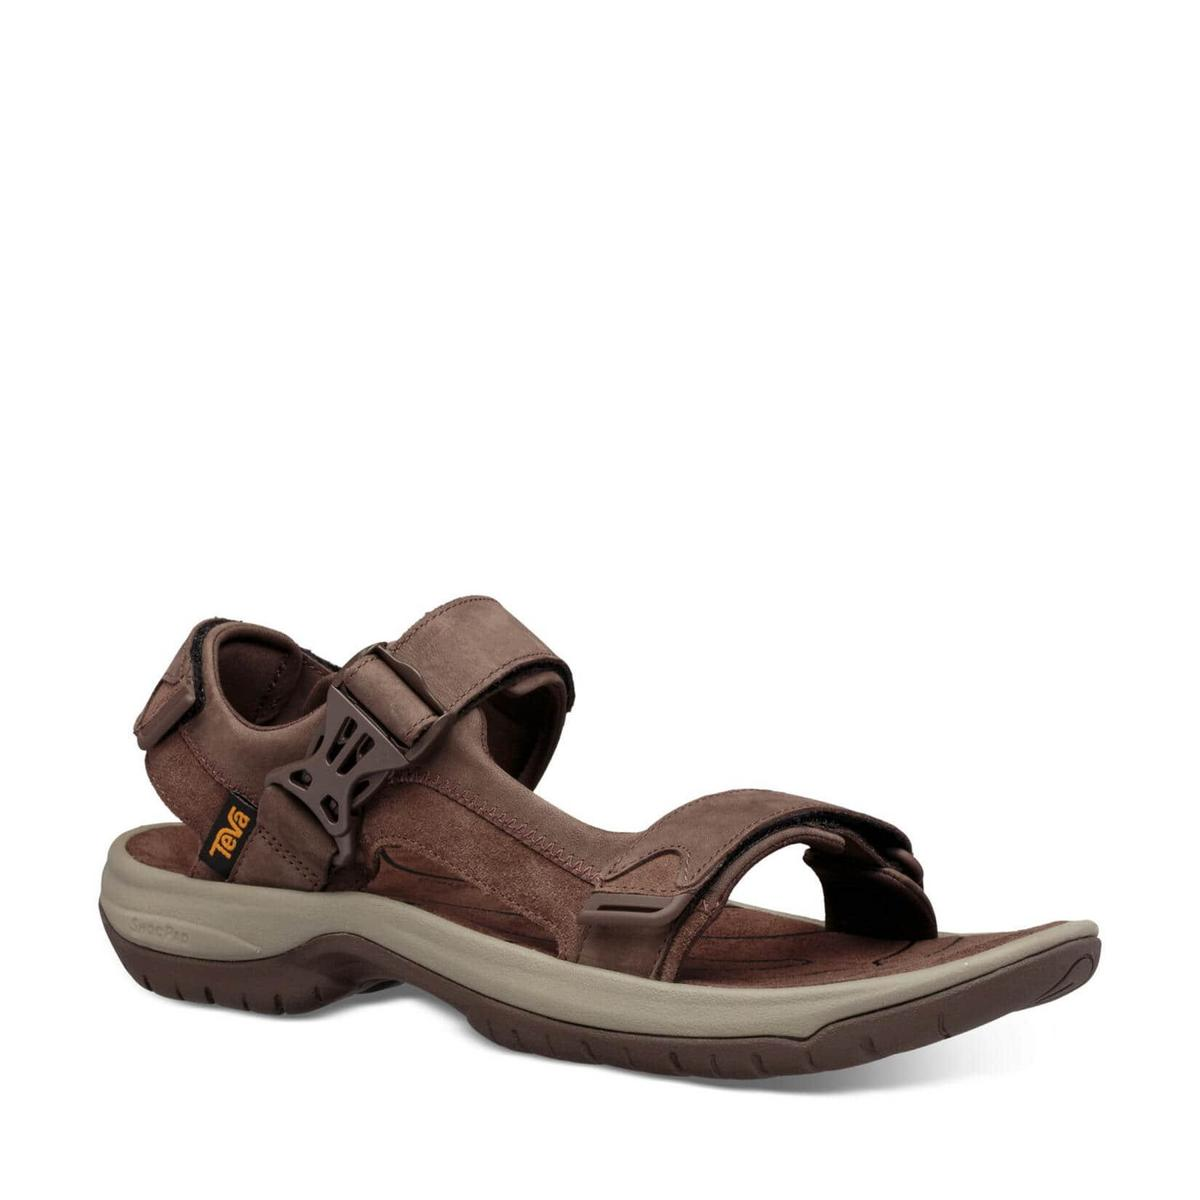 Teva Men's Teva Tanway Leather - Brown